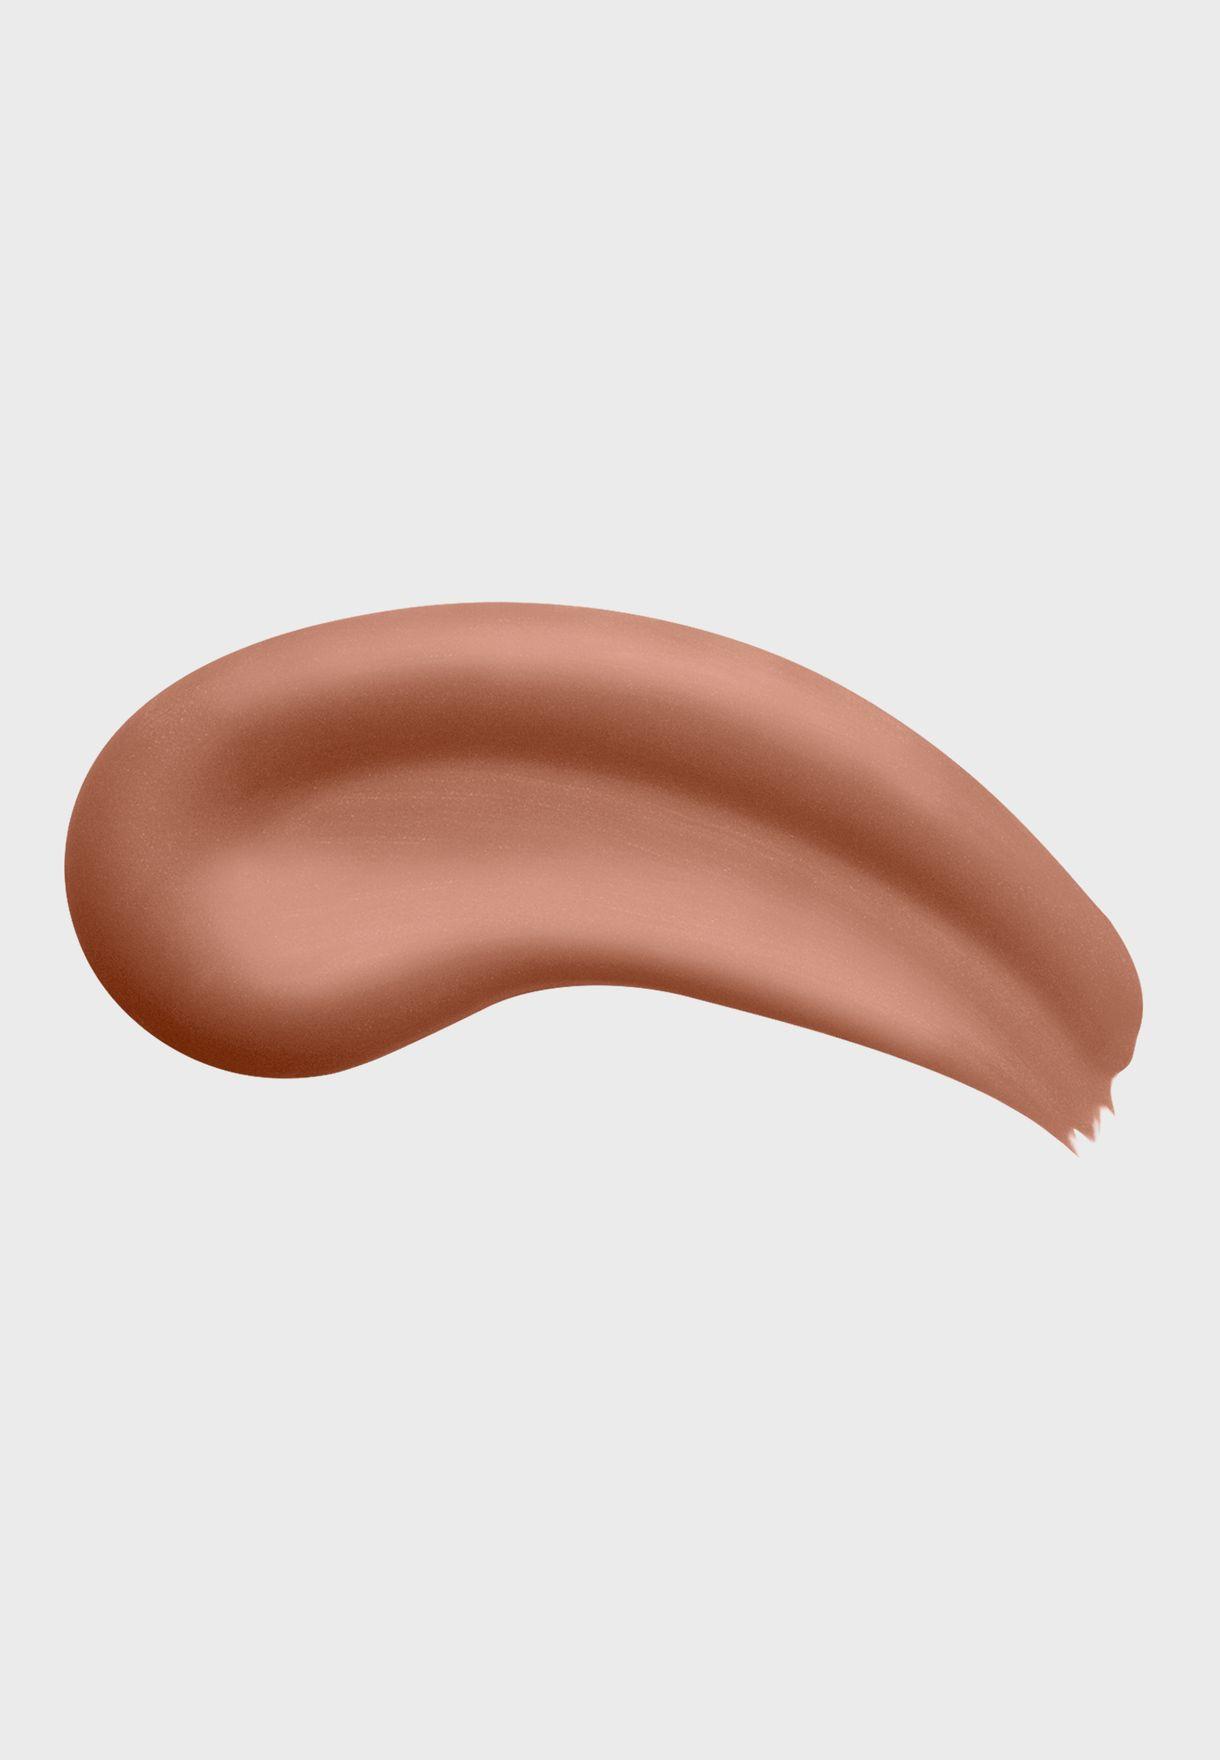 Sweet Tooth Chocolates Lipstick 844